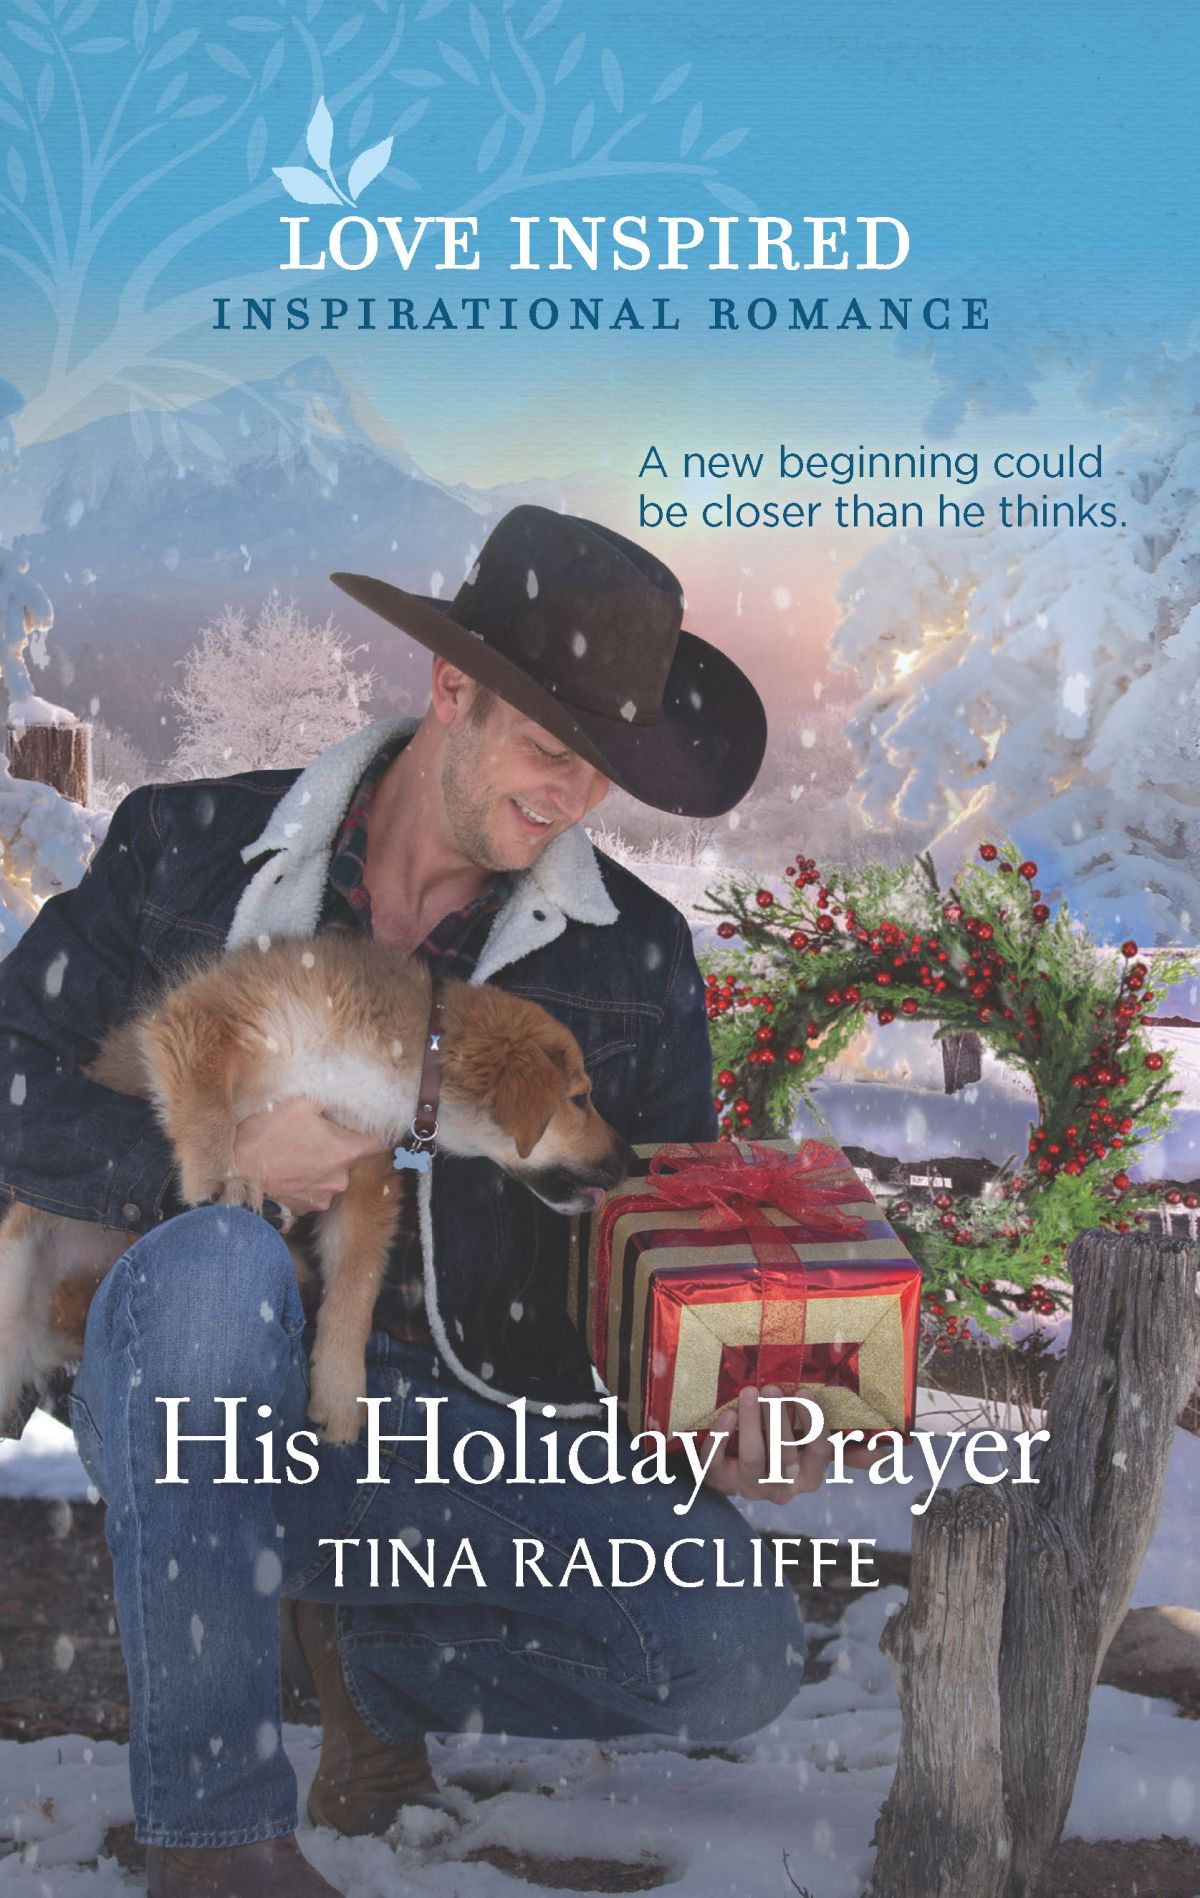 His Holiday Prayer by TinaRadcliffe